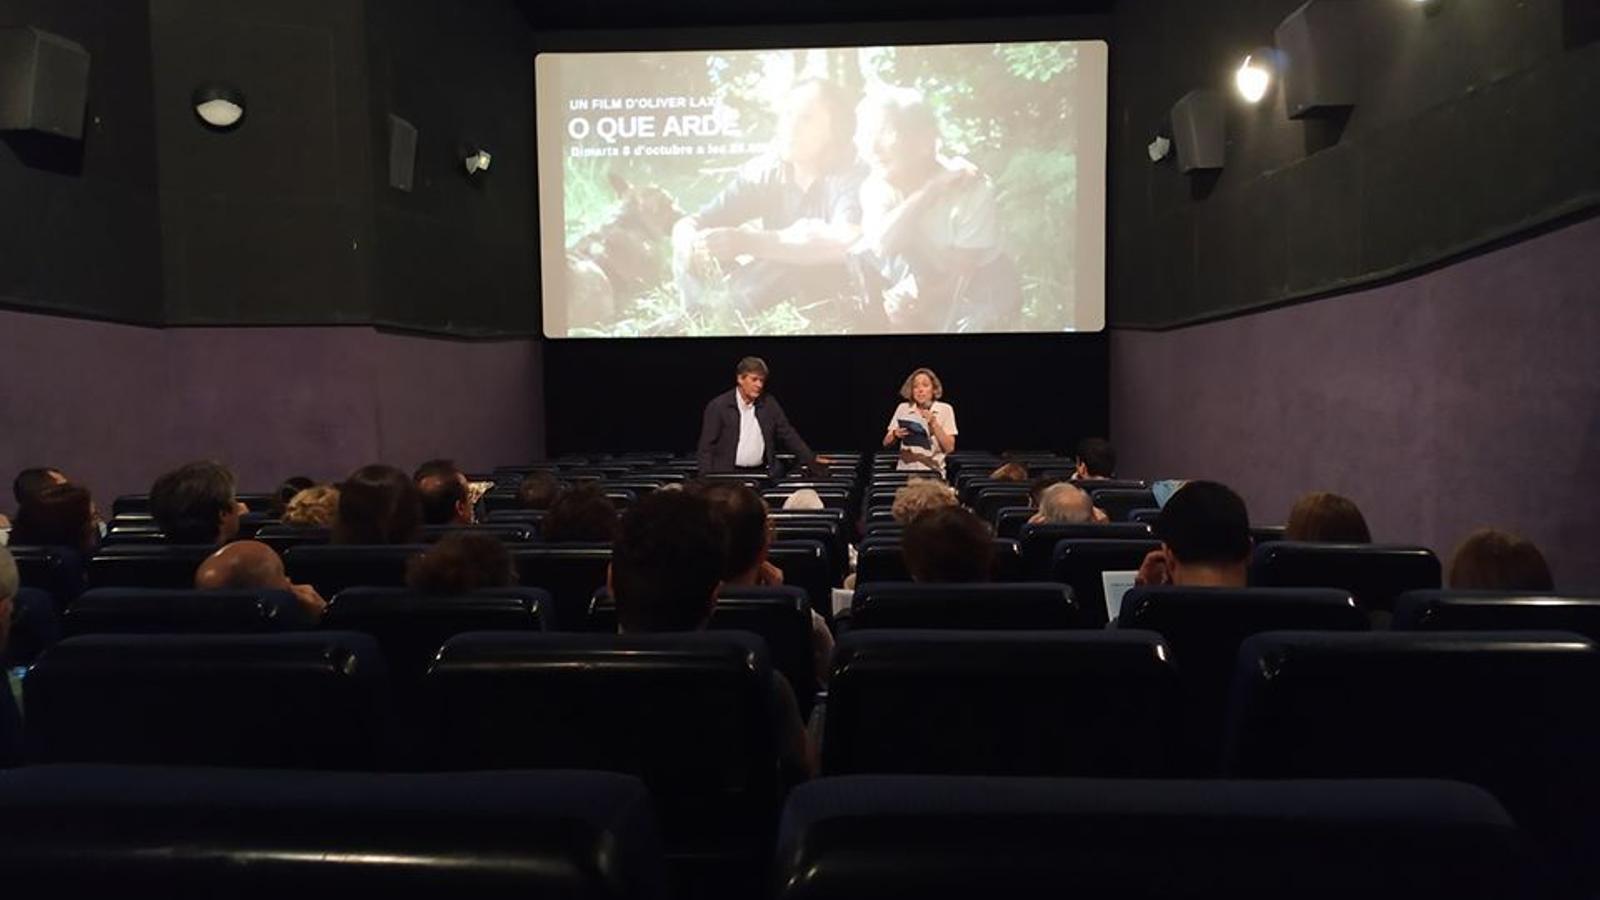 El cinema Truffaut de Girona en una imatge d'arxiu